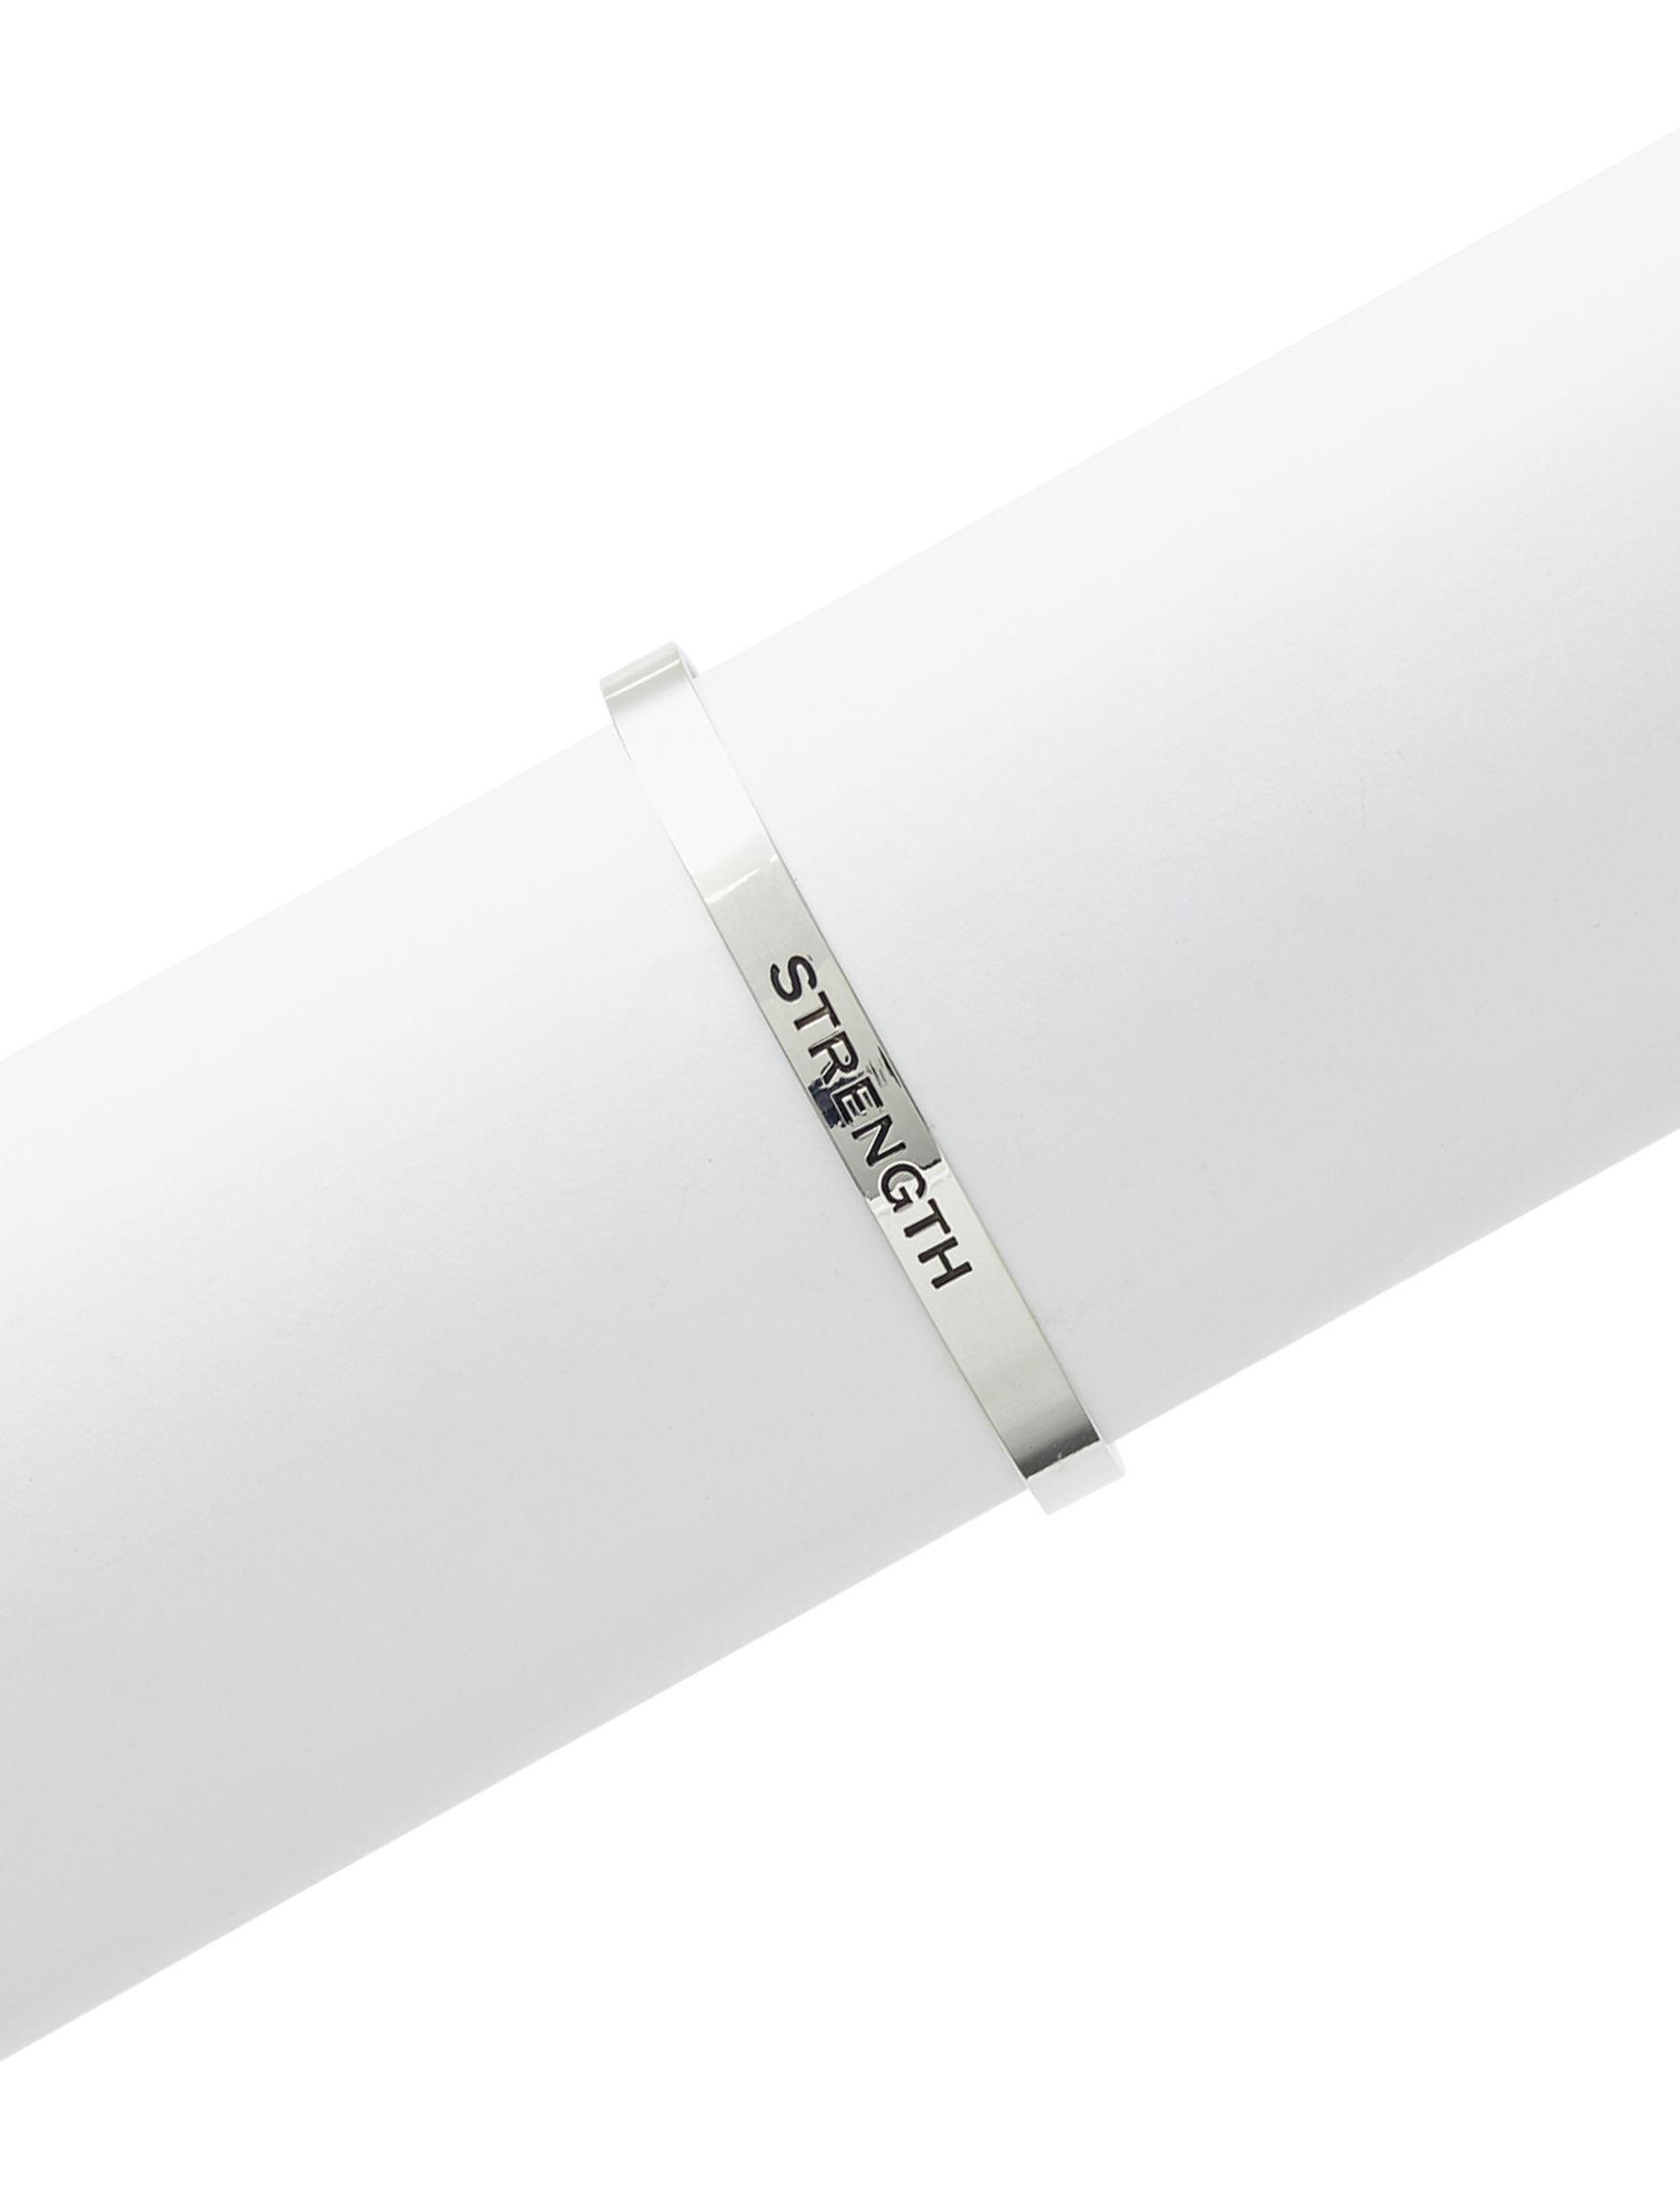 Tanya Silver Bracelets Fashion Jewelry